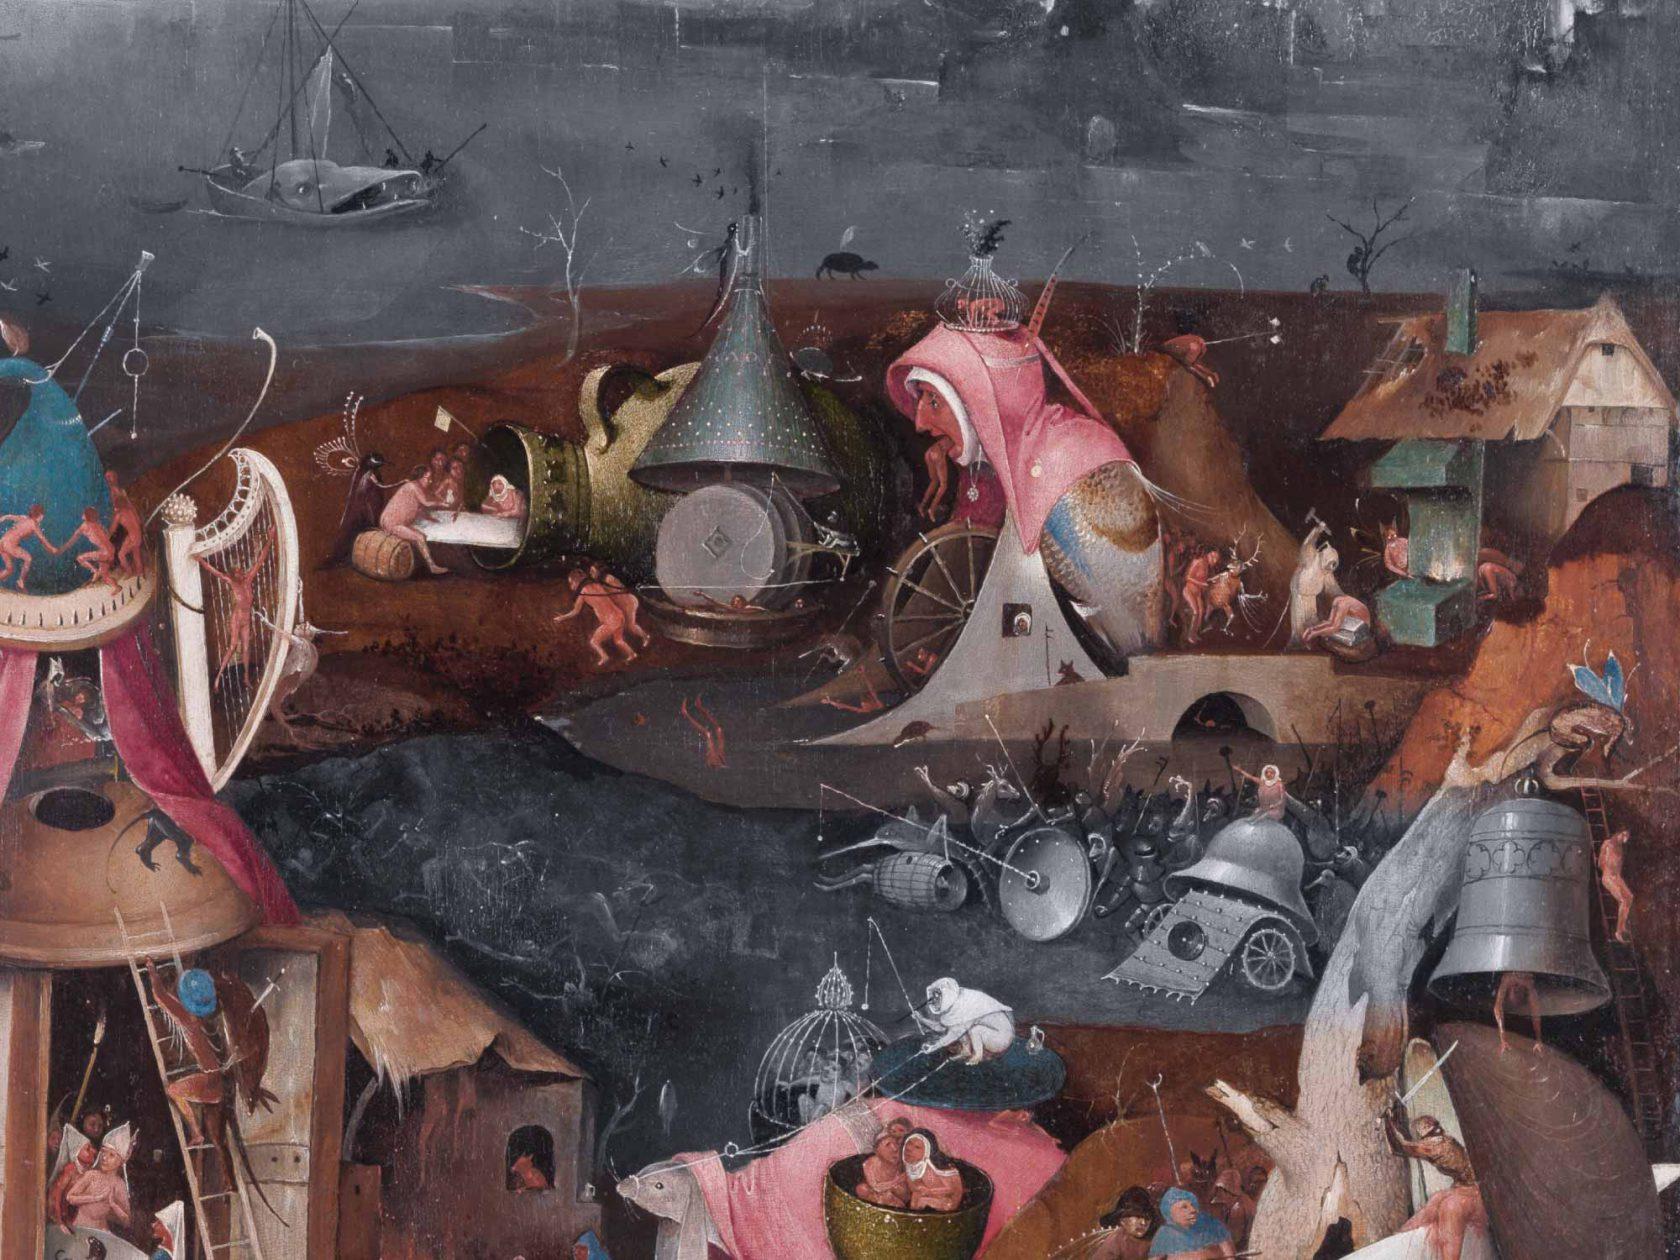 'Das jüngste Gericht' Ausschnitt, um 1500, Hieronymus Bosch, [Public domain], via Wikimedia Commons